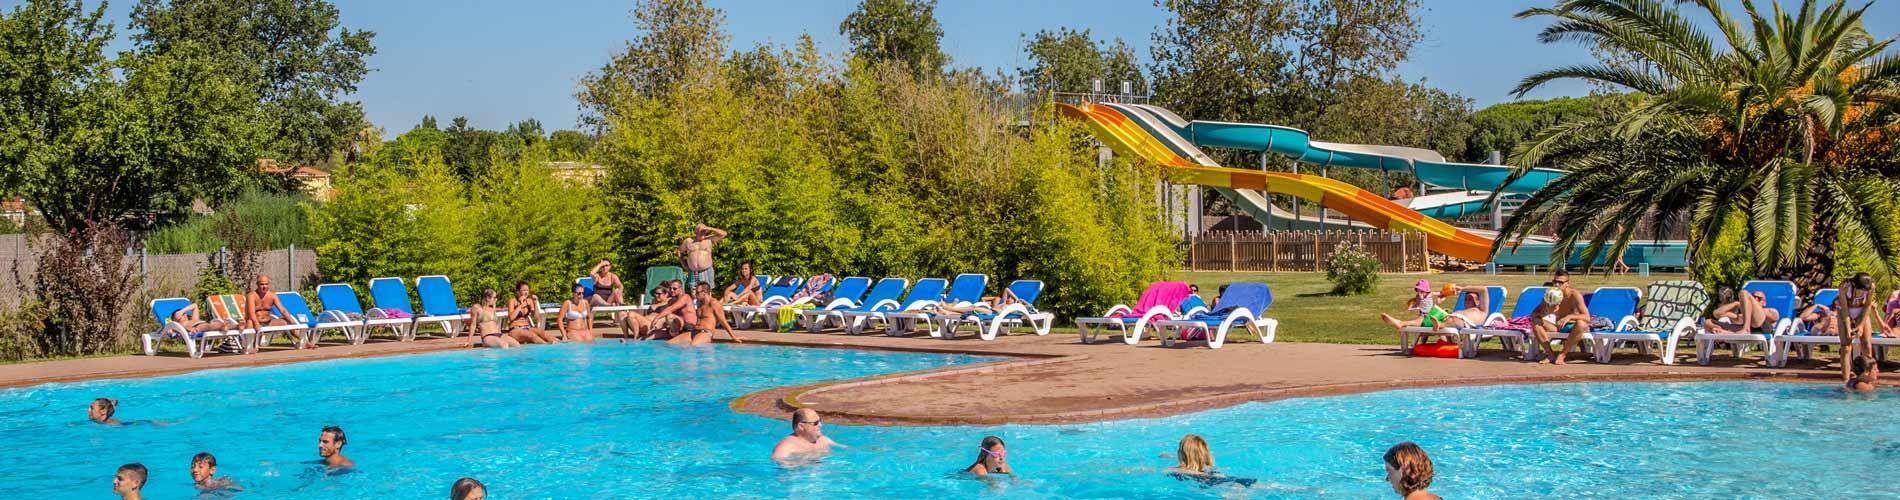 Campings argeles sur mer avec piscine parc aquatique for Camping la turballe avec piscine